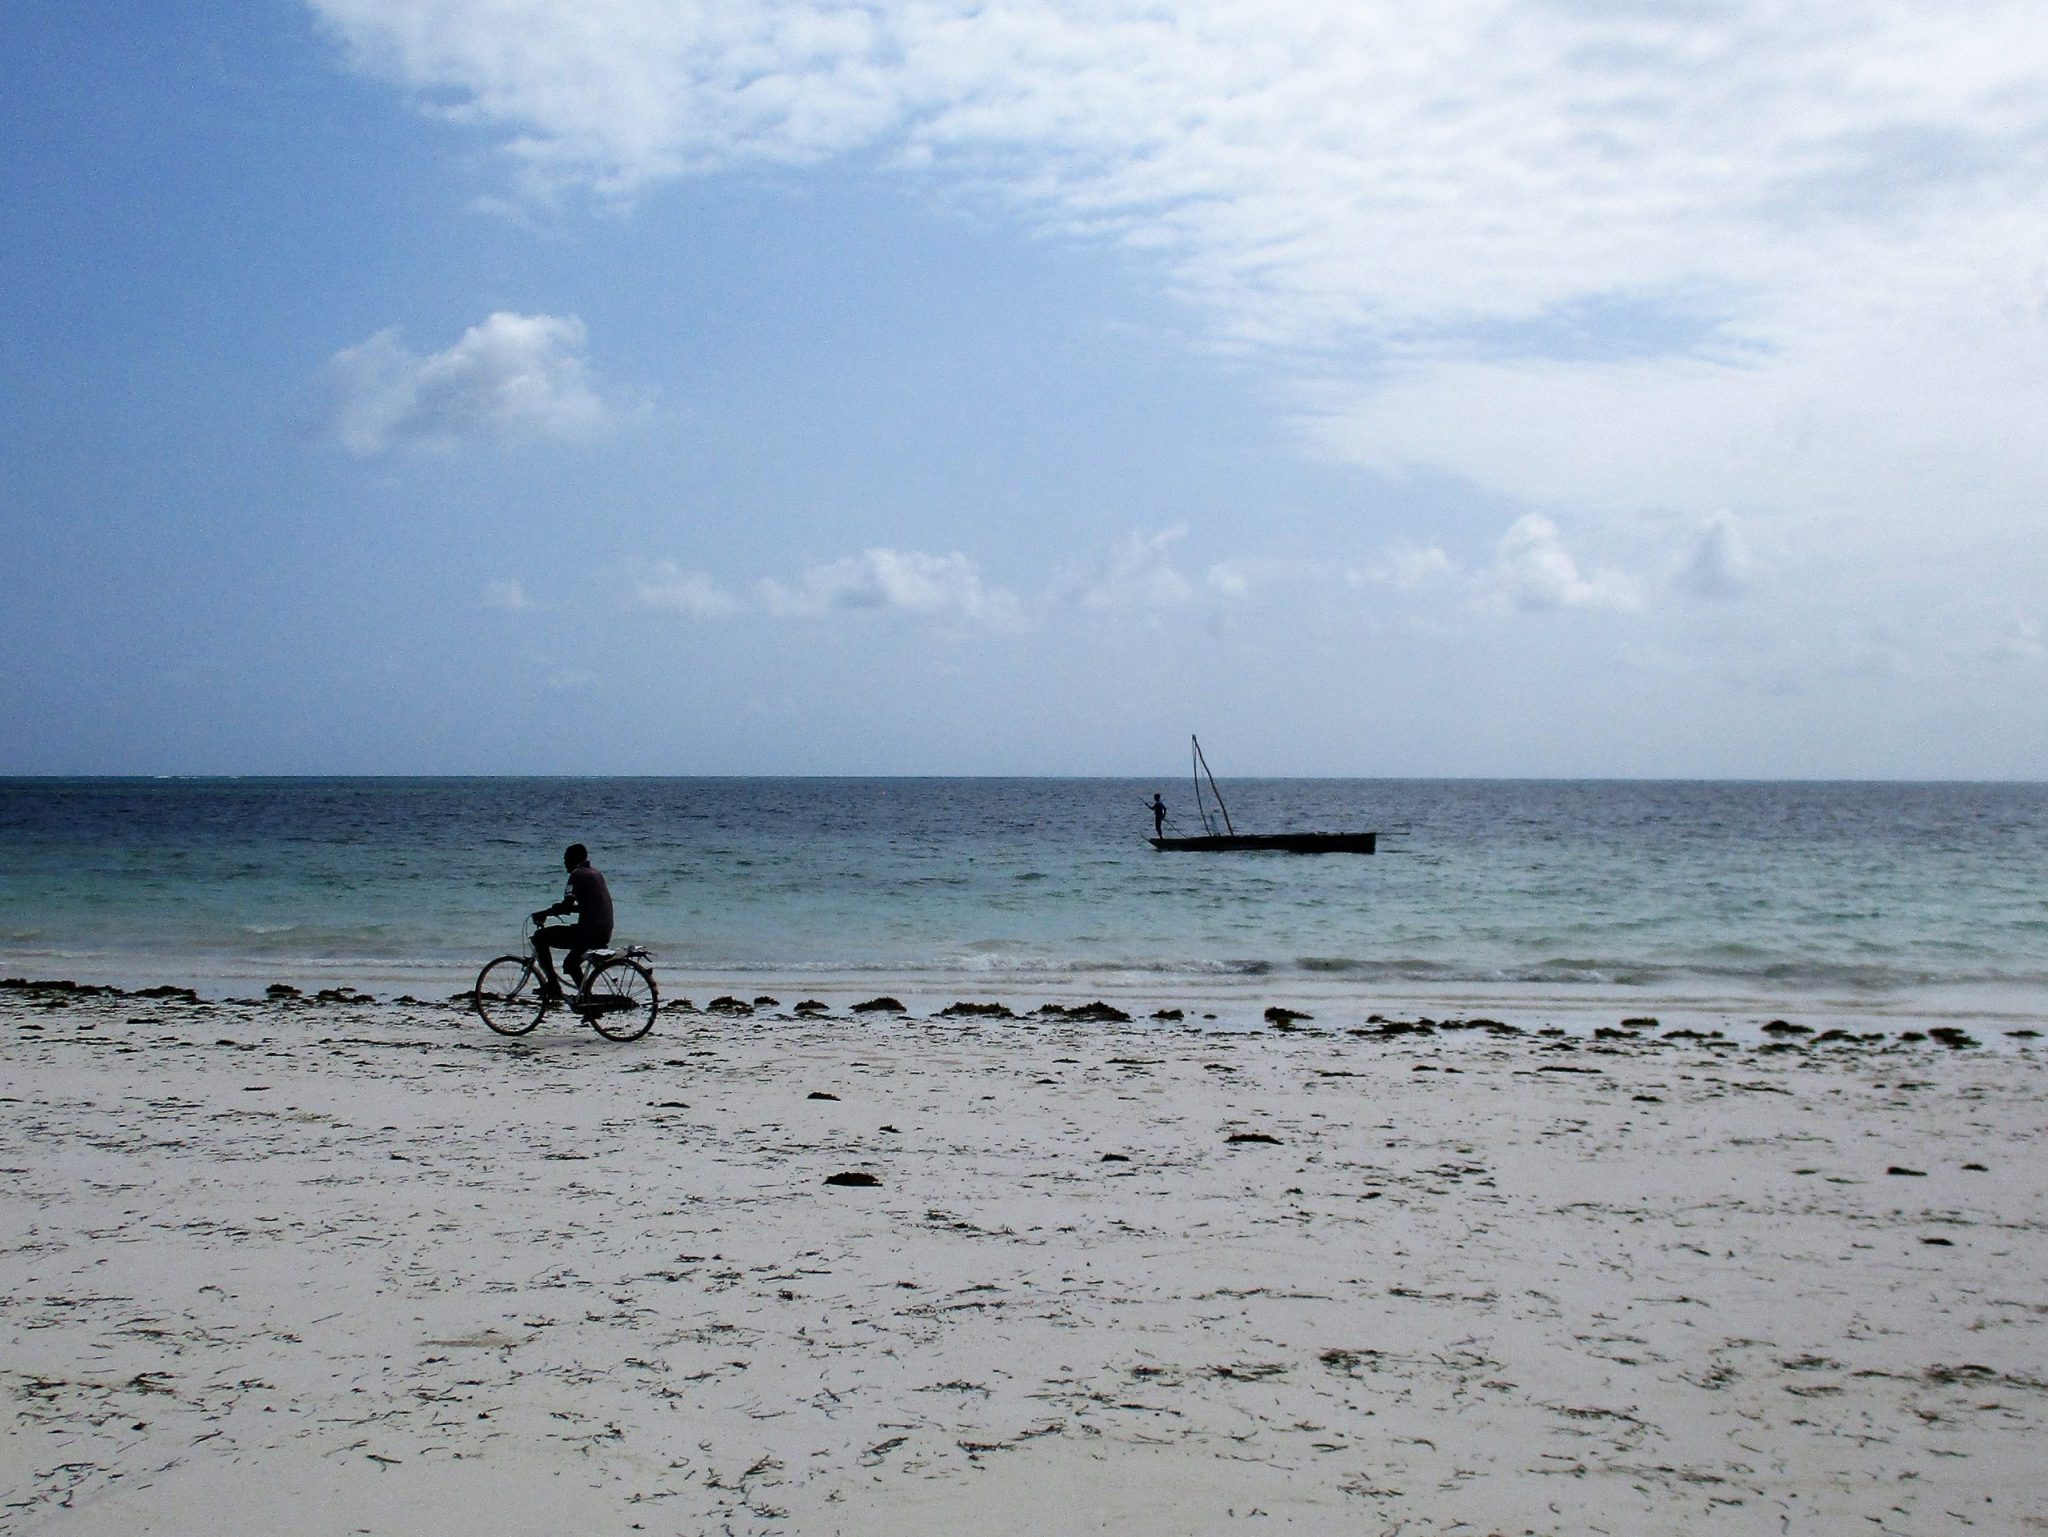 A photo of the beach